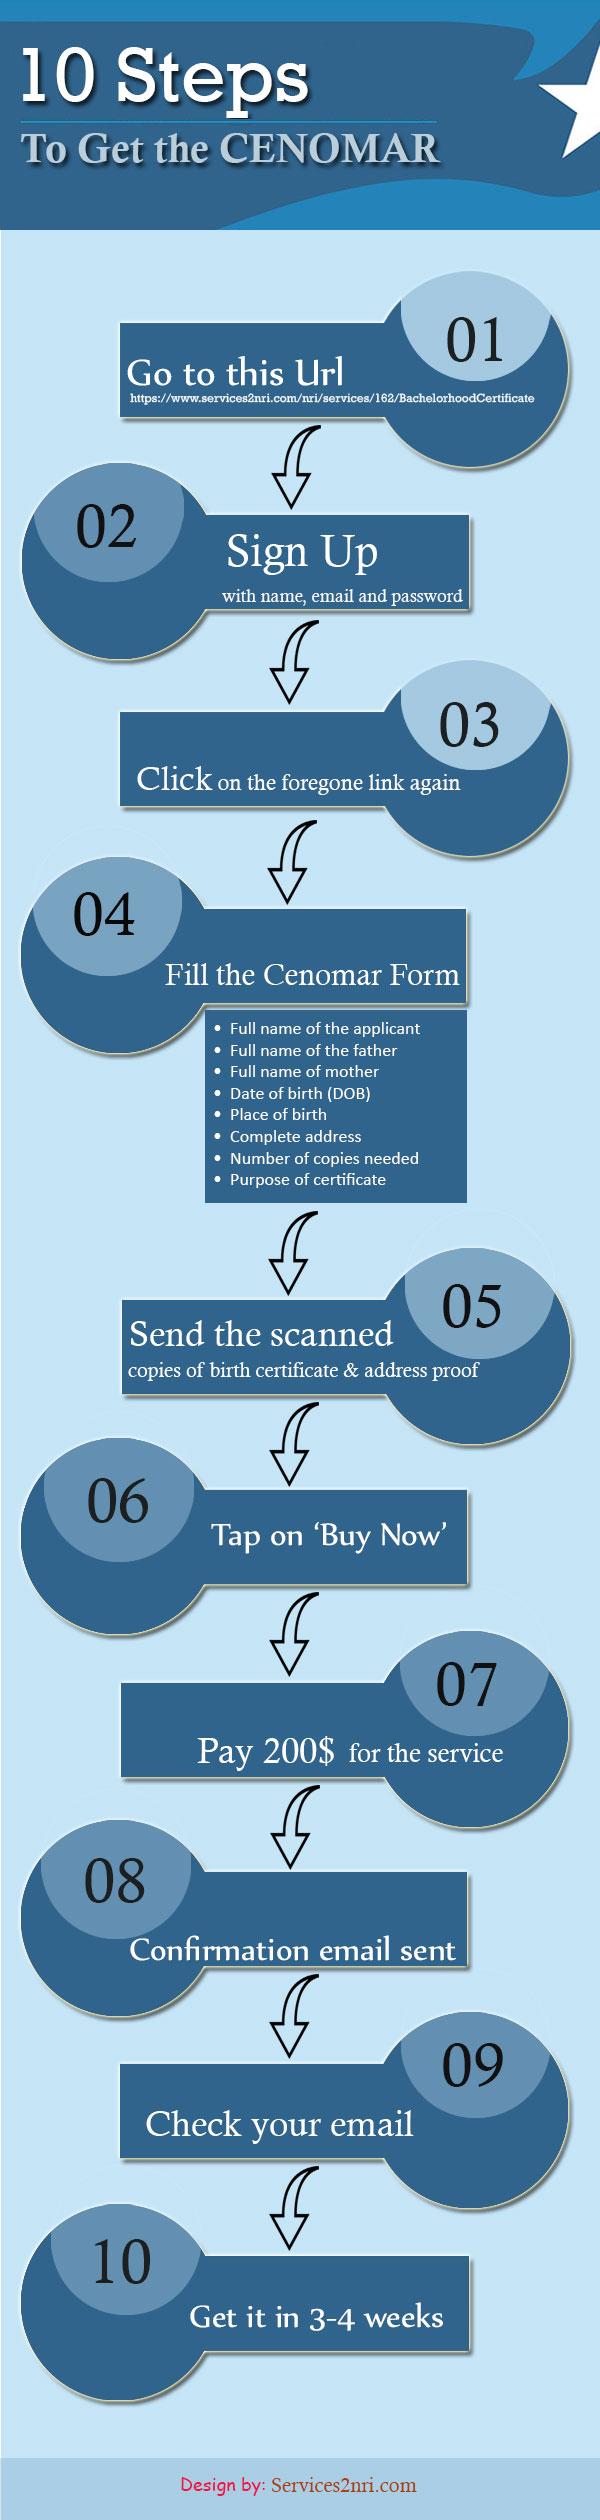 Steps to Get CENOMAR